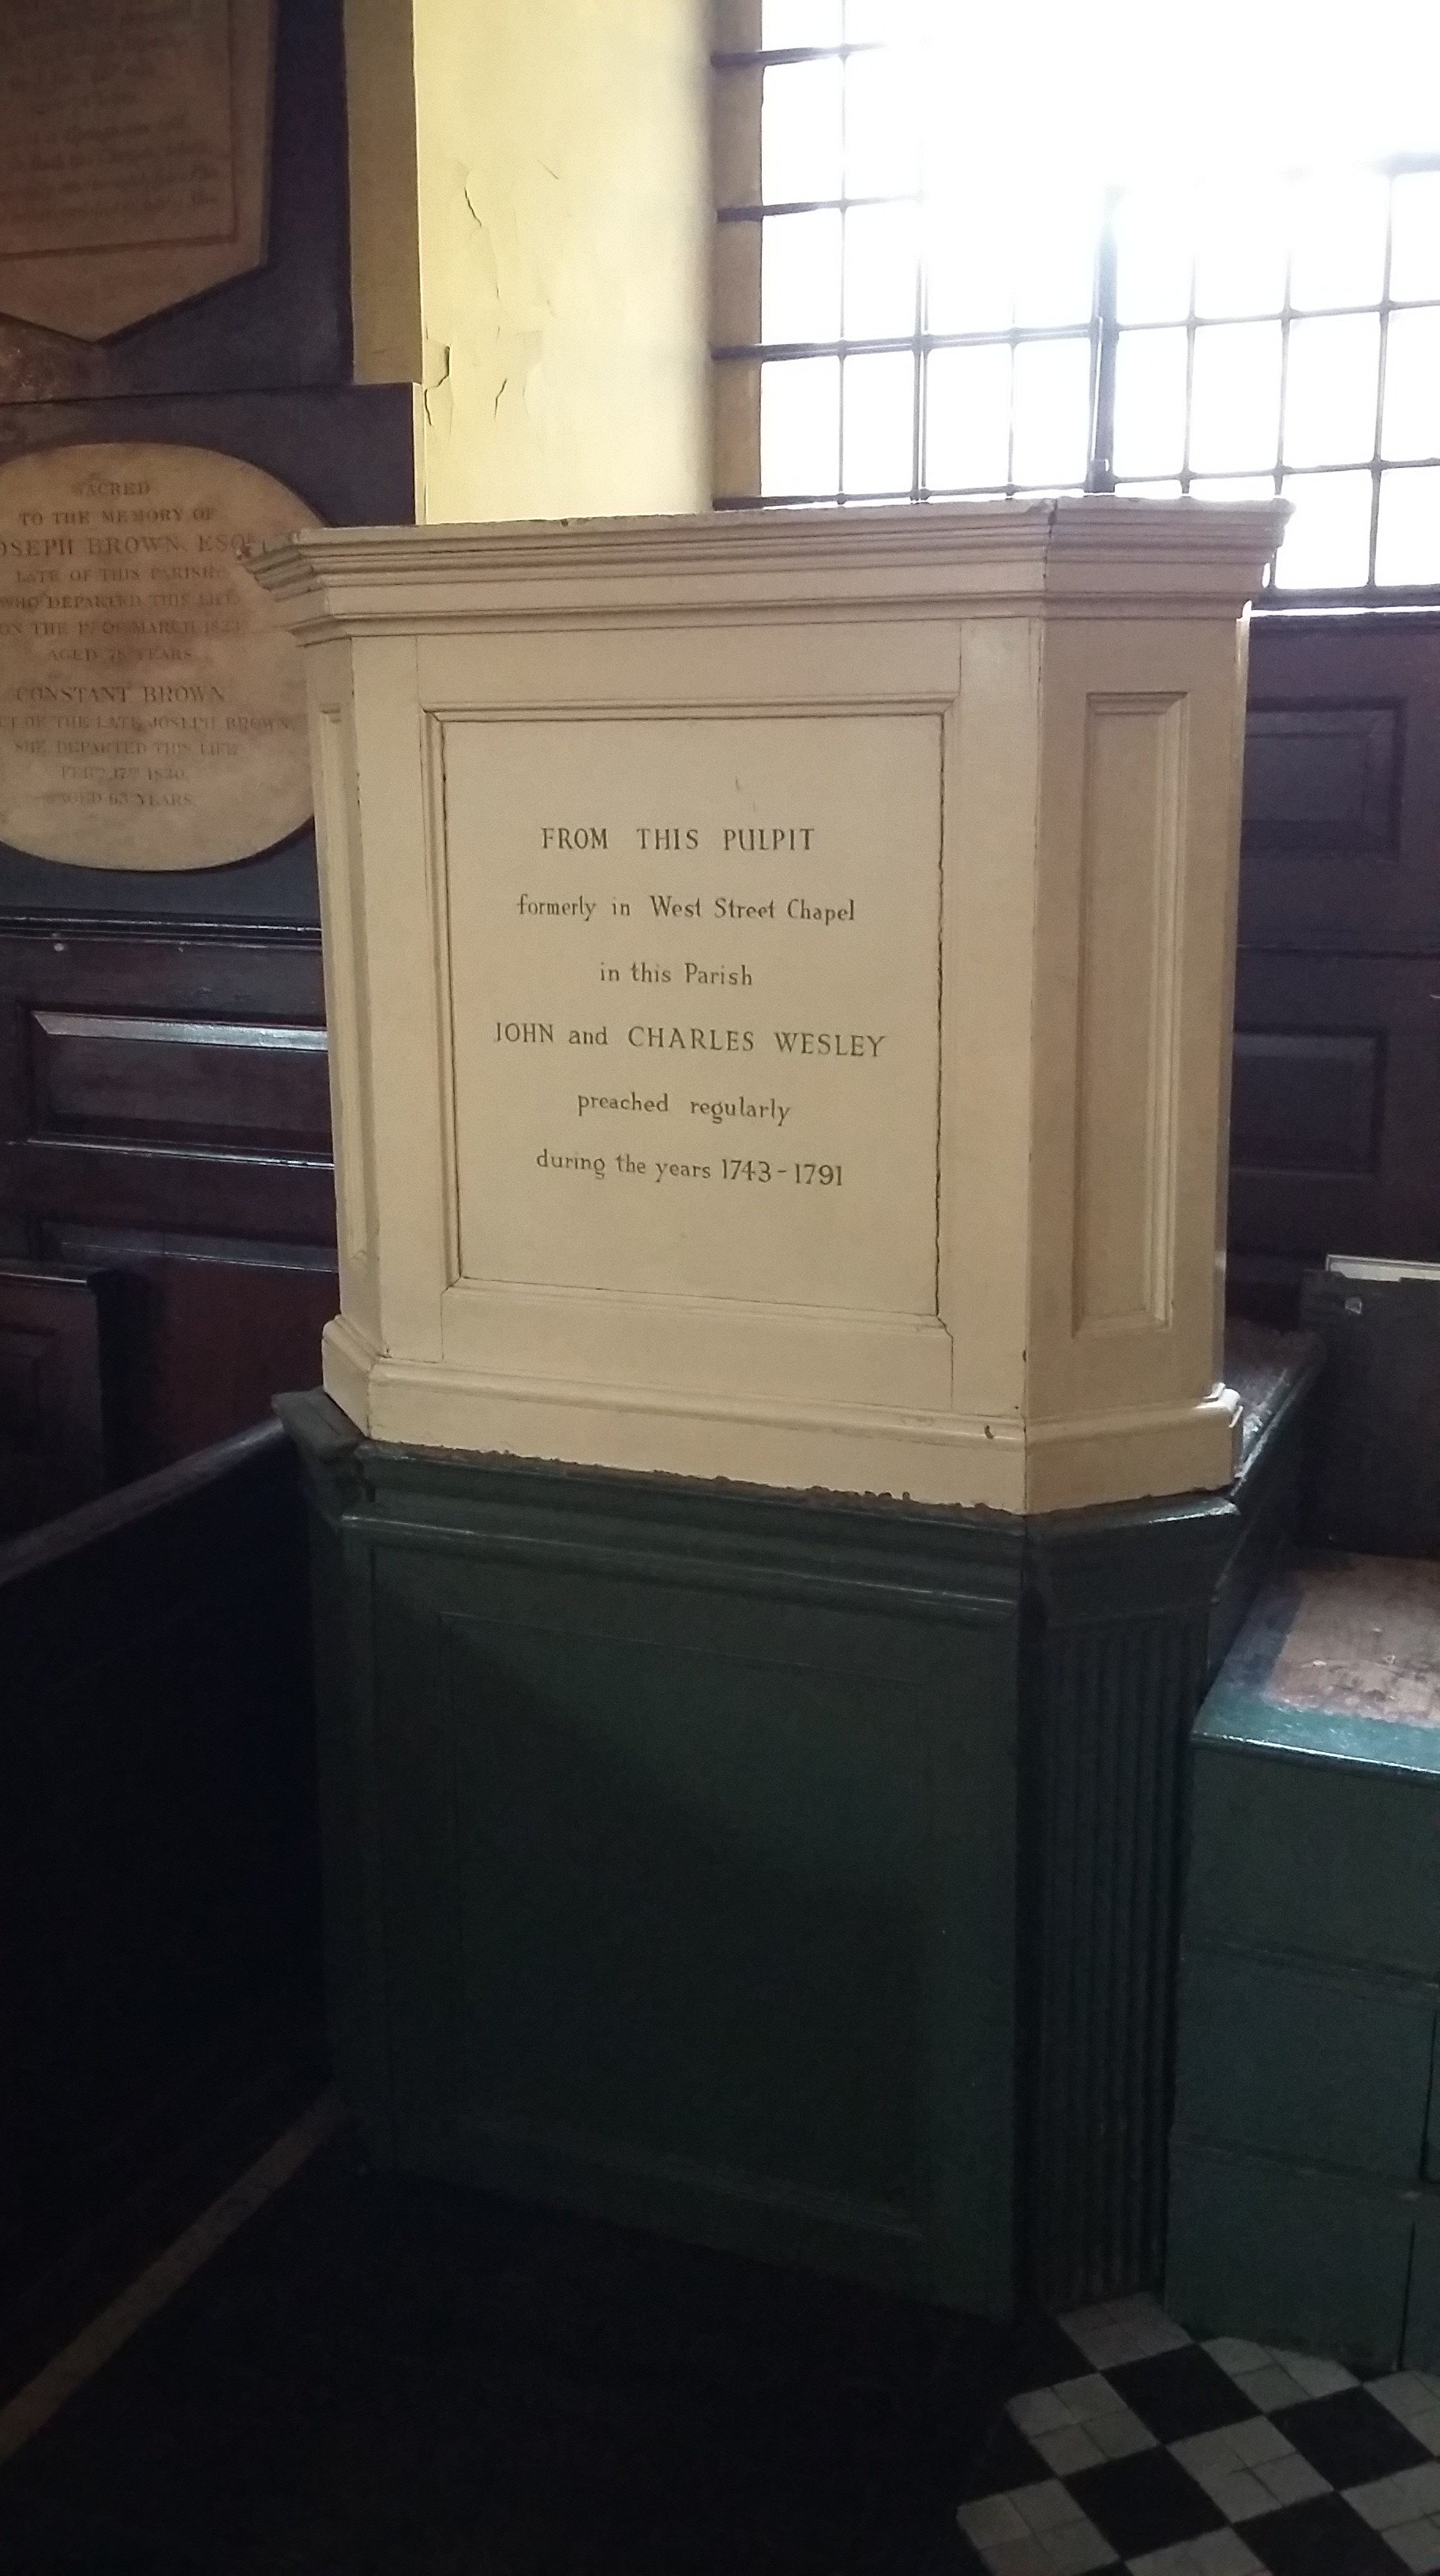 Wesley's pulpit